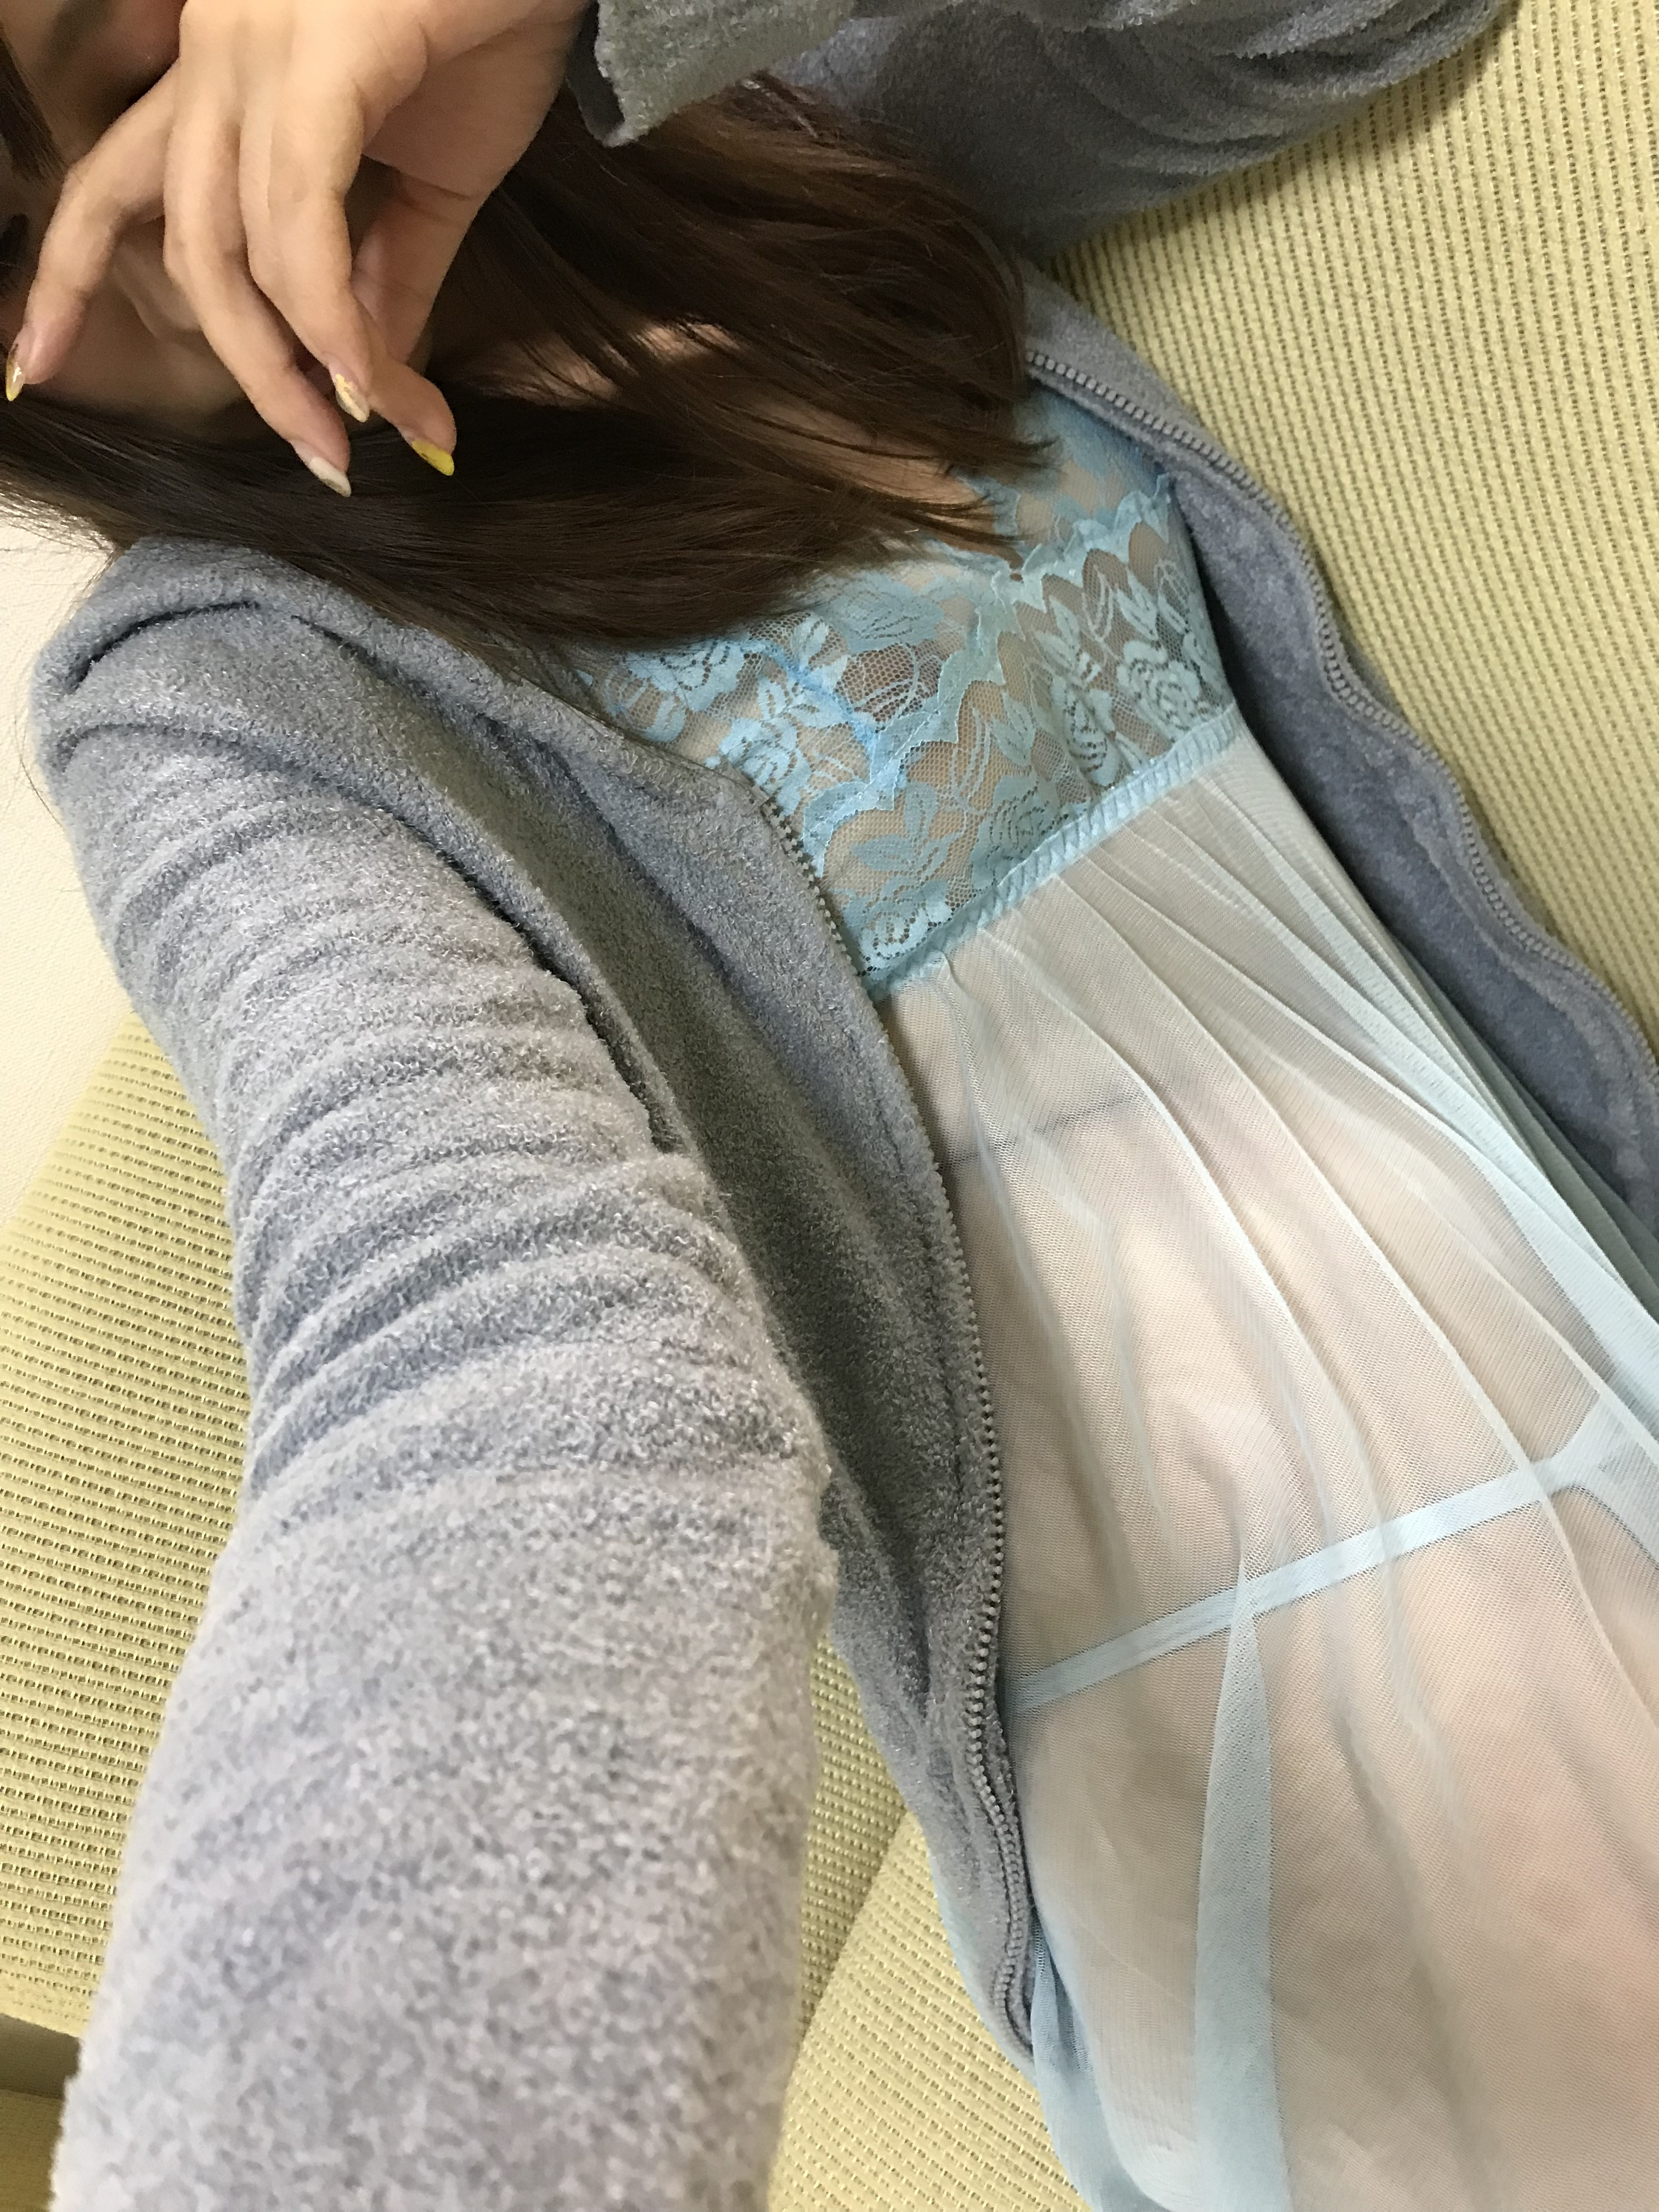 Suzuka888 - Japanese webcam girl